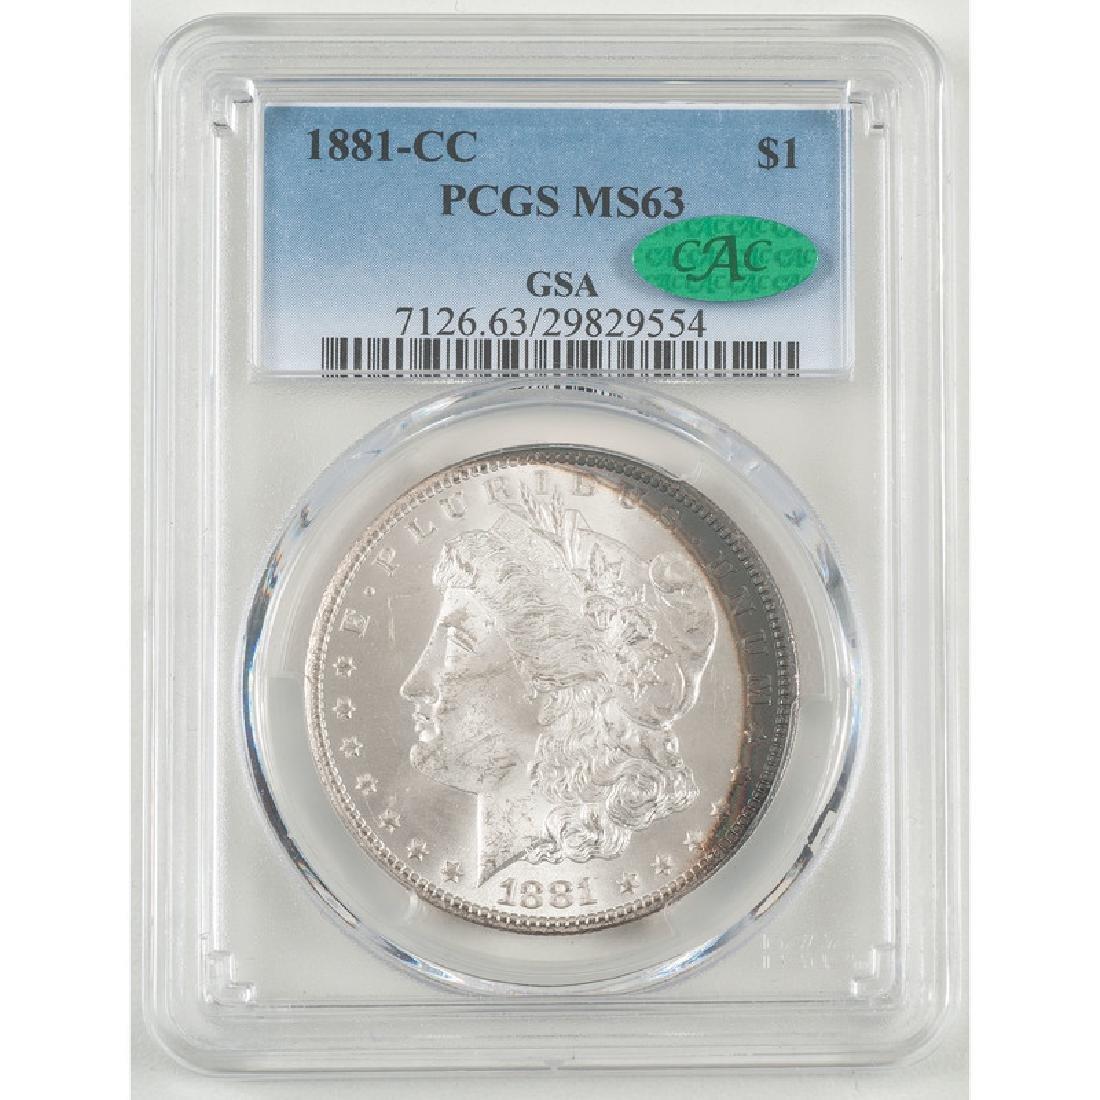 United States Morgan Silver Dollar 1881-CC, GSA, PCGS